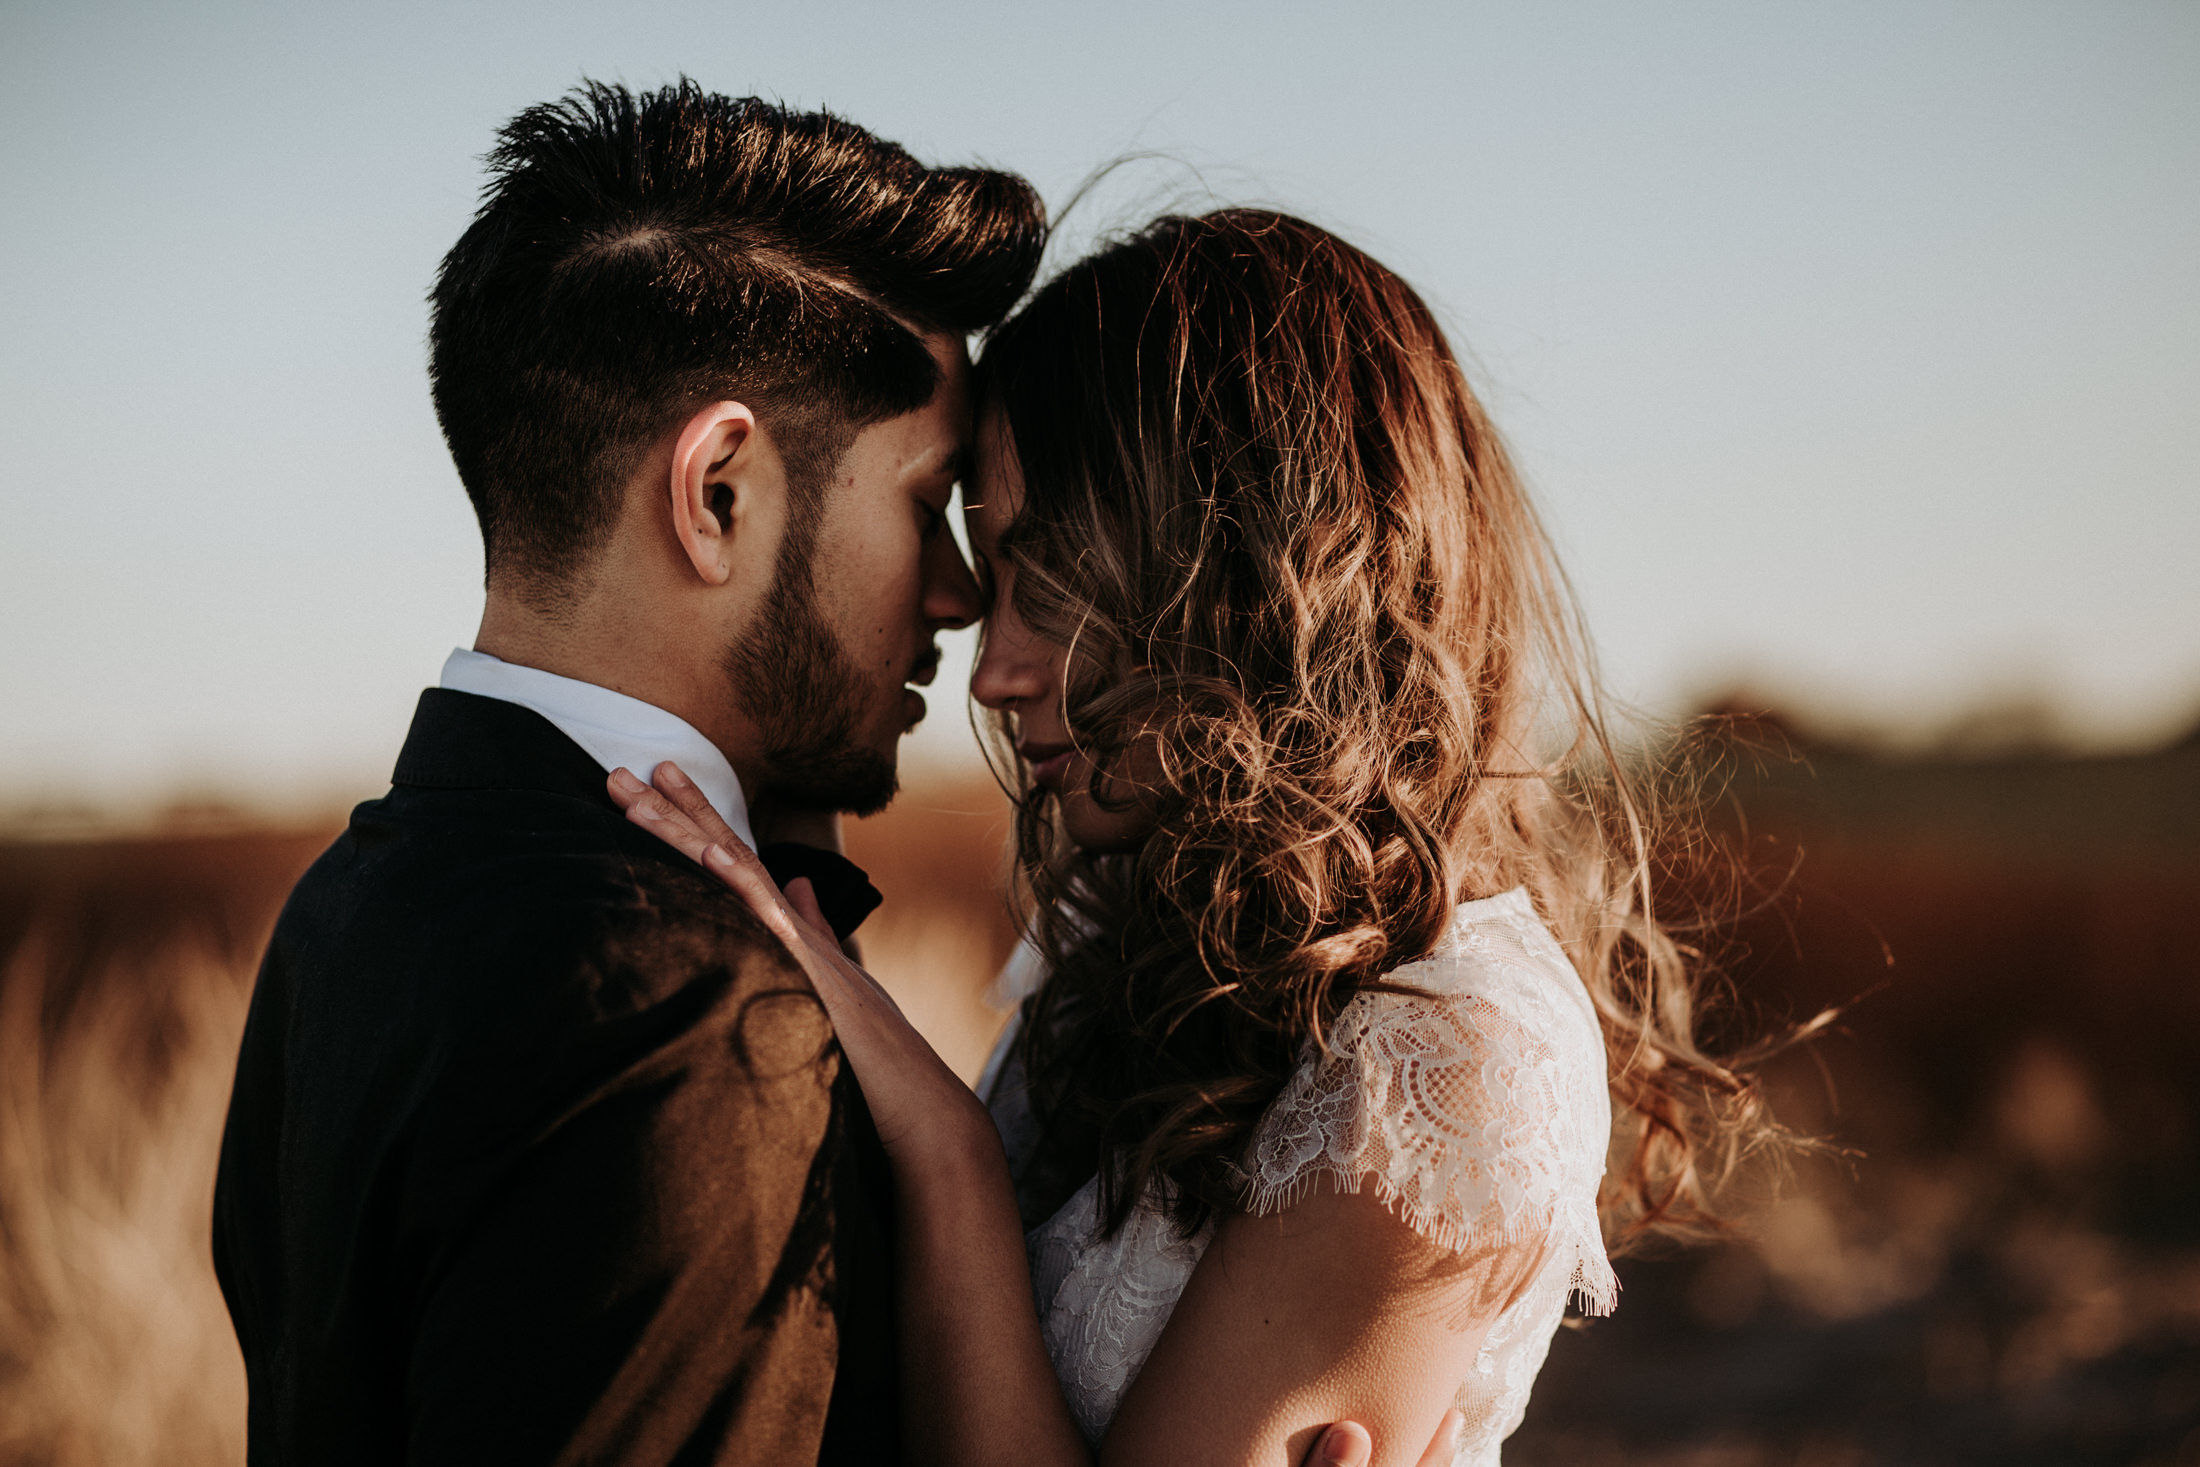 Wedding_Photographer_Mallorca_Daniela-Marquardt_Photography_CanaryIslands_Lanzarote_Iceland_Tuskany_Santorini_Portugal_Schweiz_Austria_Bayern_Elopement_Hochzeitsfotograf_Norddeichich_48